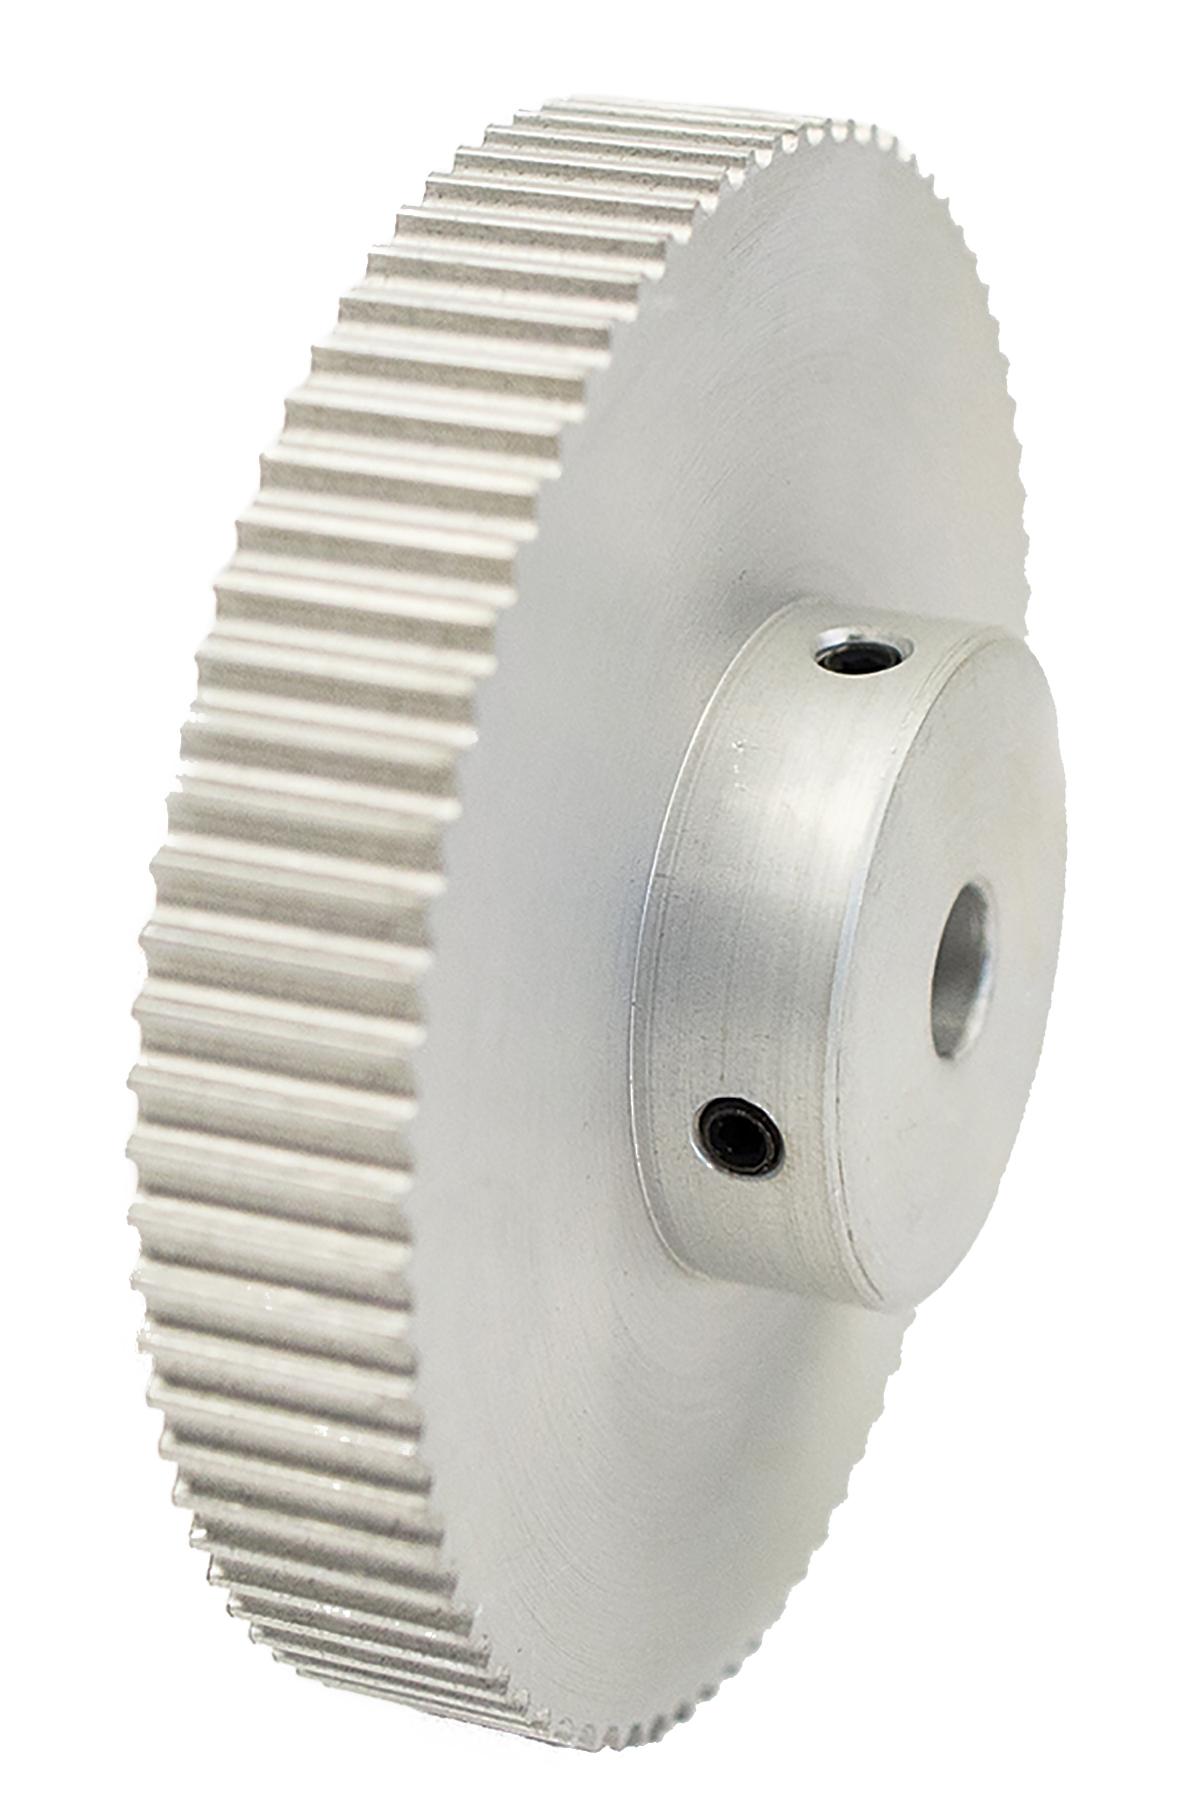 80-3P09-6A4 - Aluminum Powerhouse® Pulleys